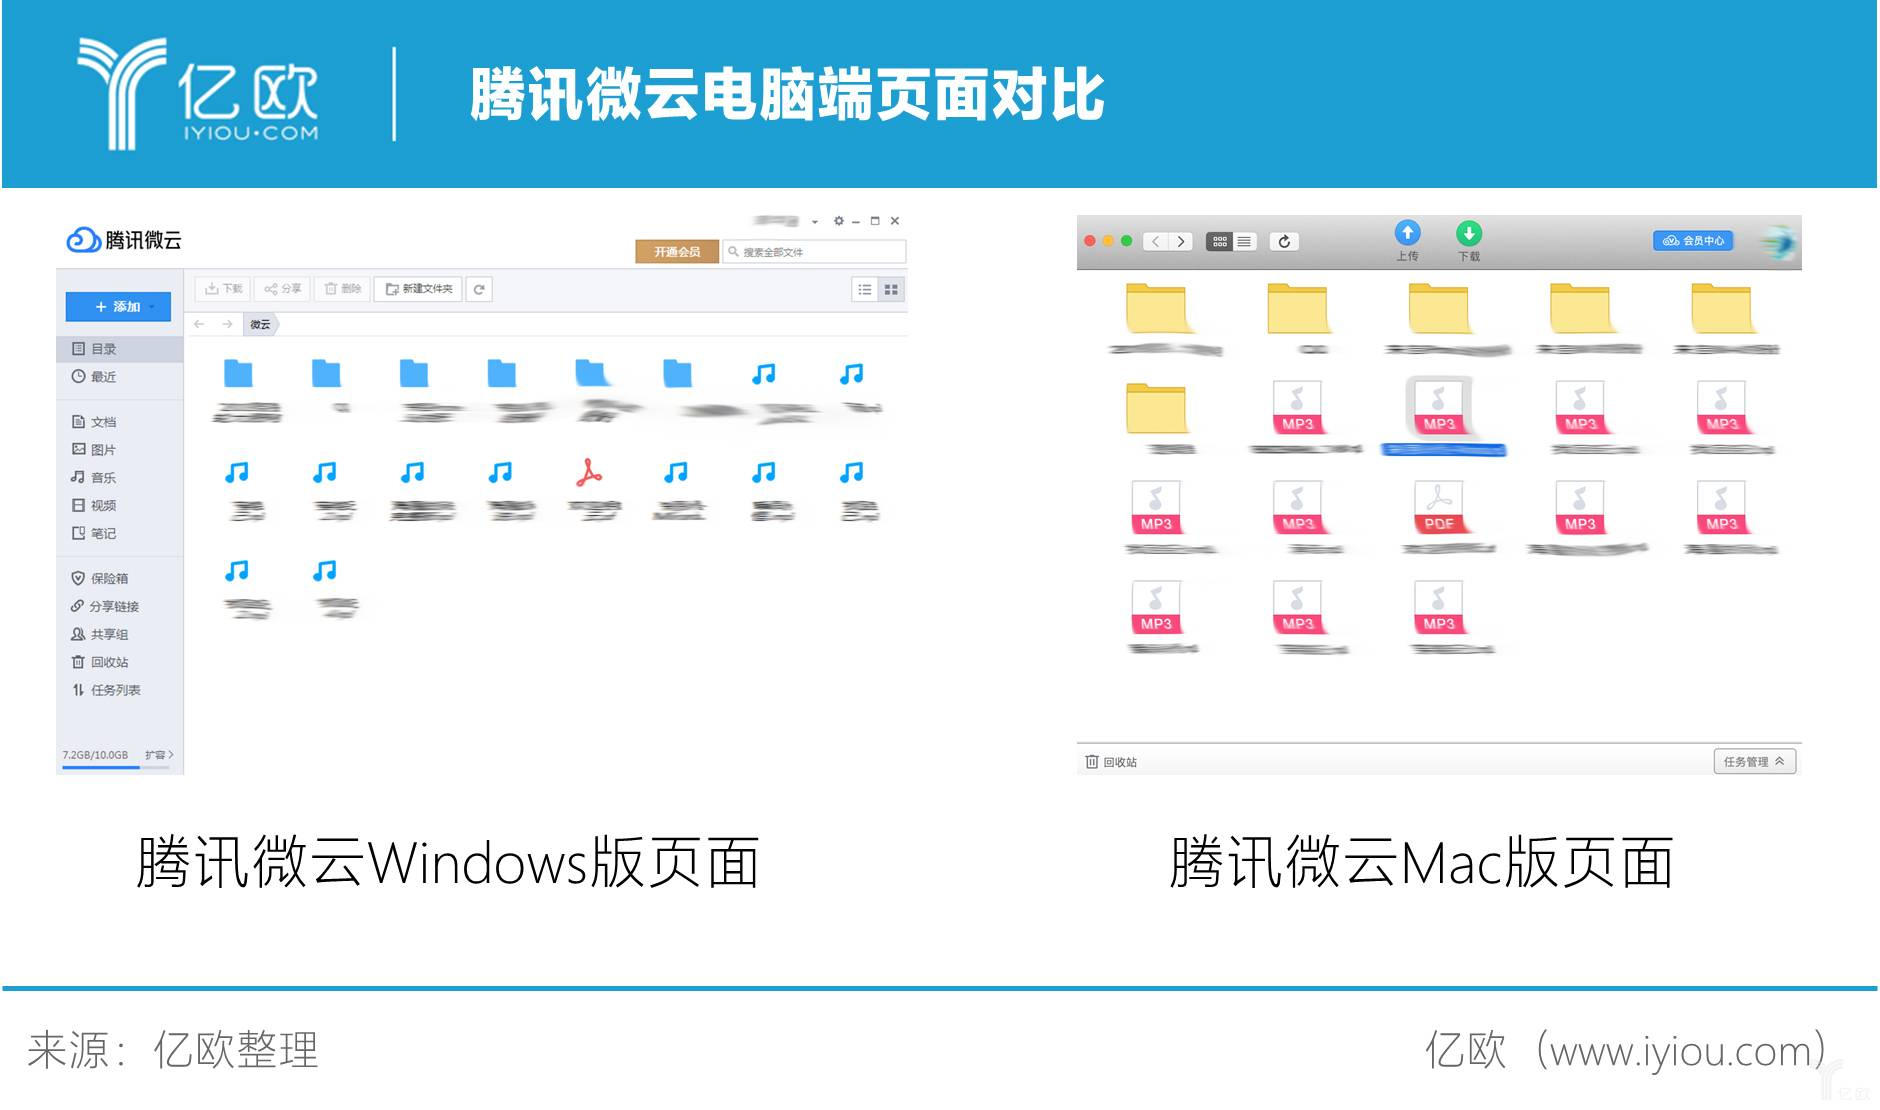 Tencent微云电脑端页面对比.jpg